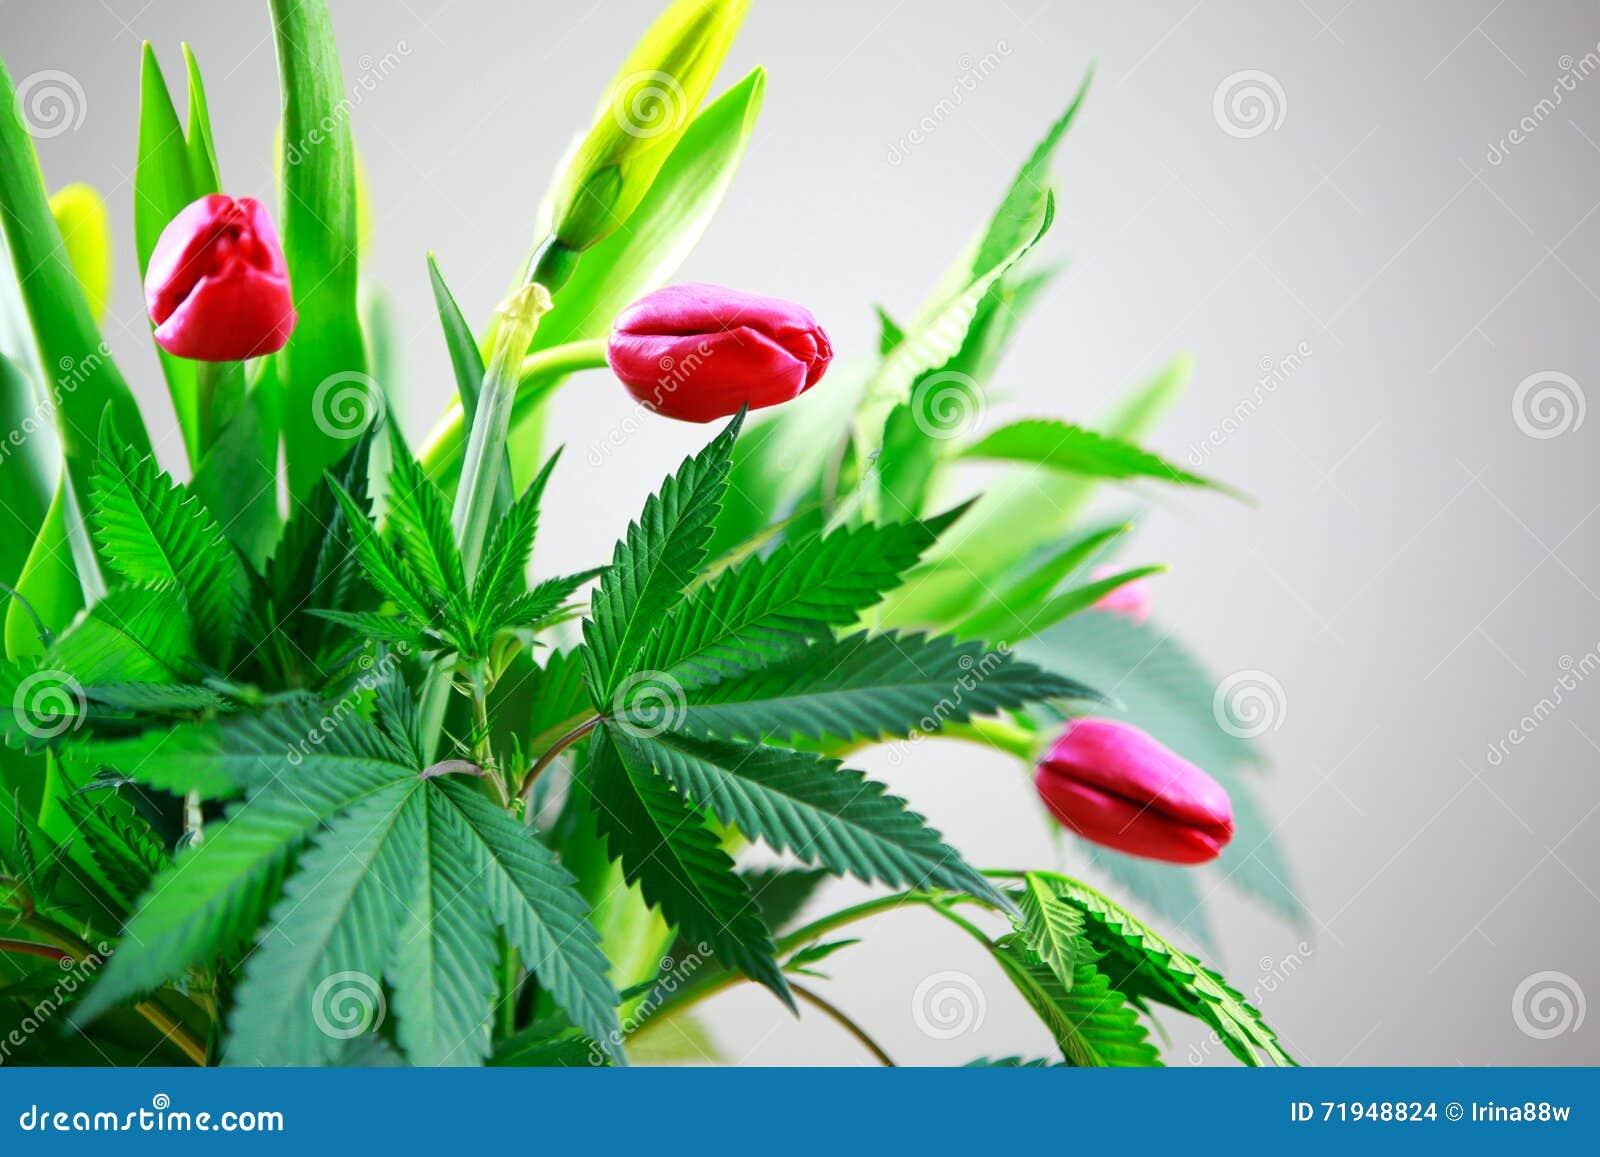 Marijuana green fresh large leafs ( cannabis), hemp plant in a n